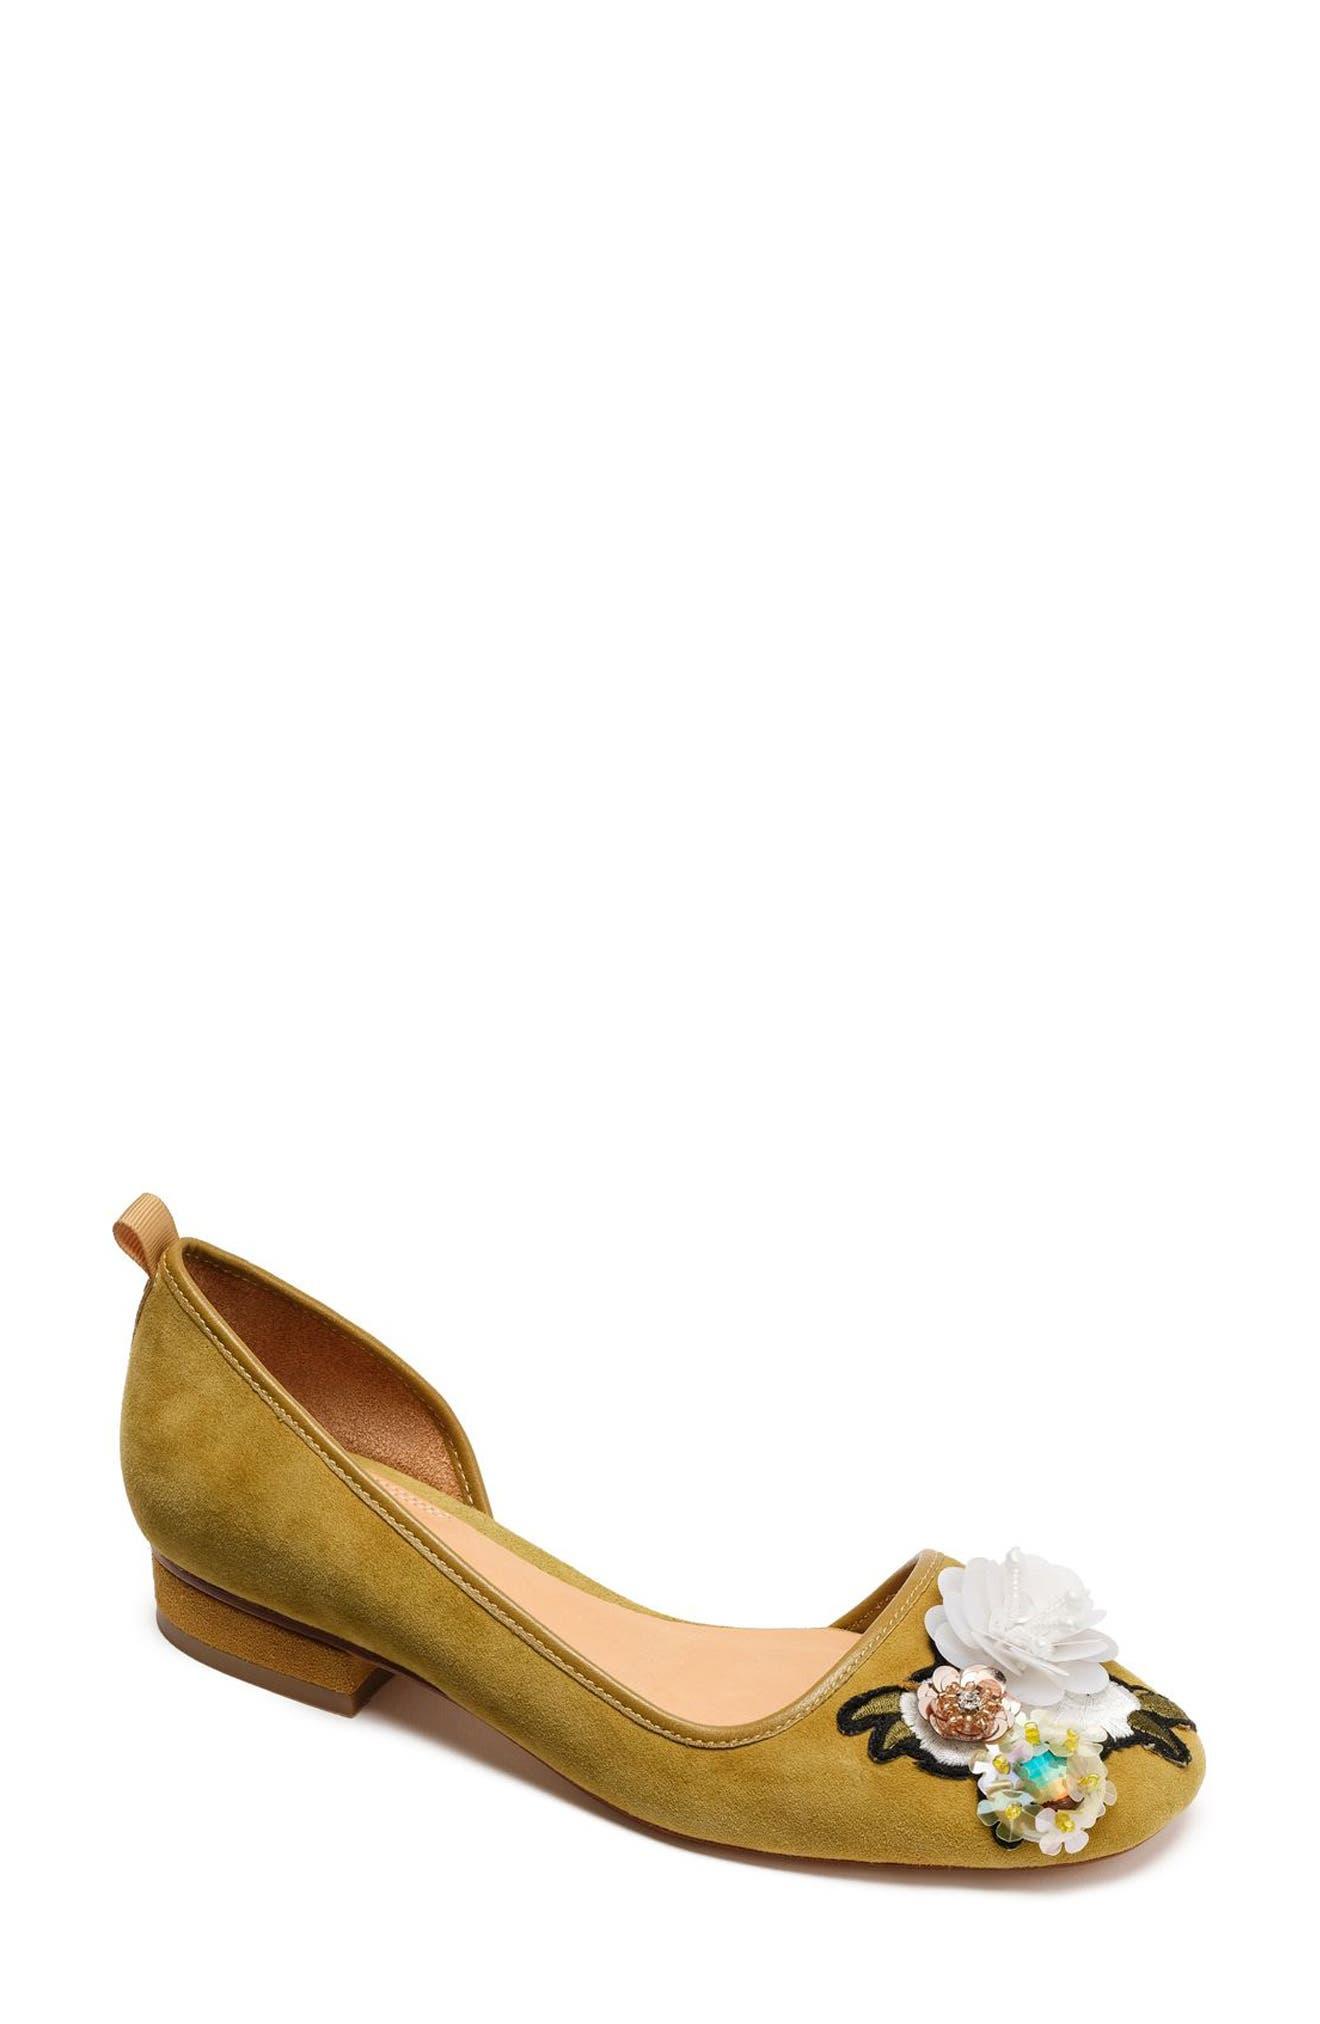 Bill Blass Lola Flower Embellished Half d'Orsay Flat (Women)